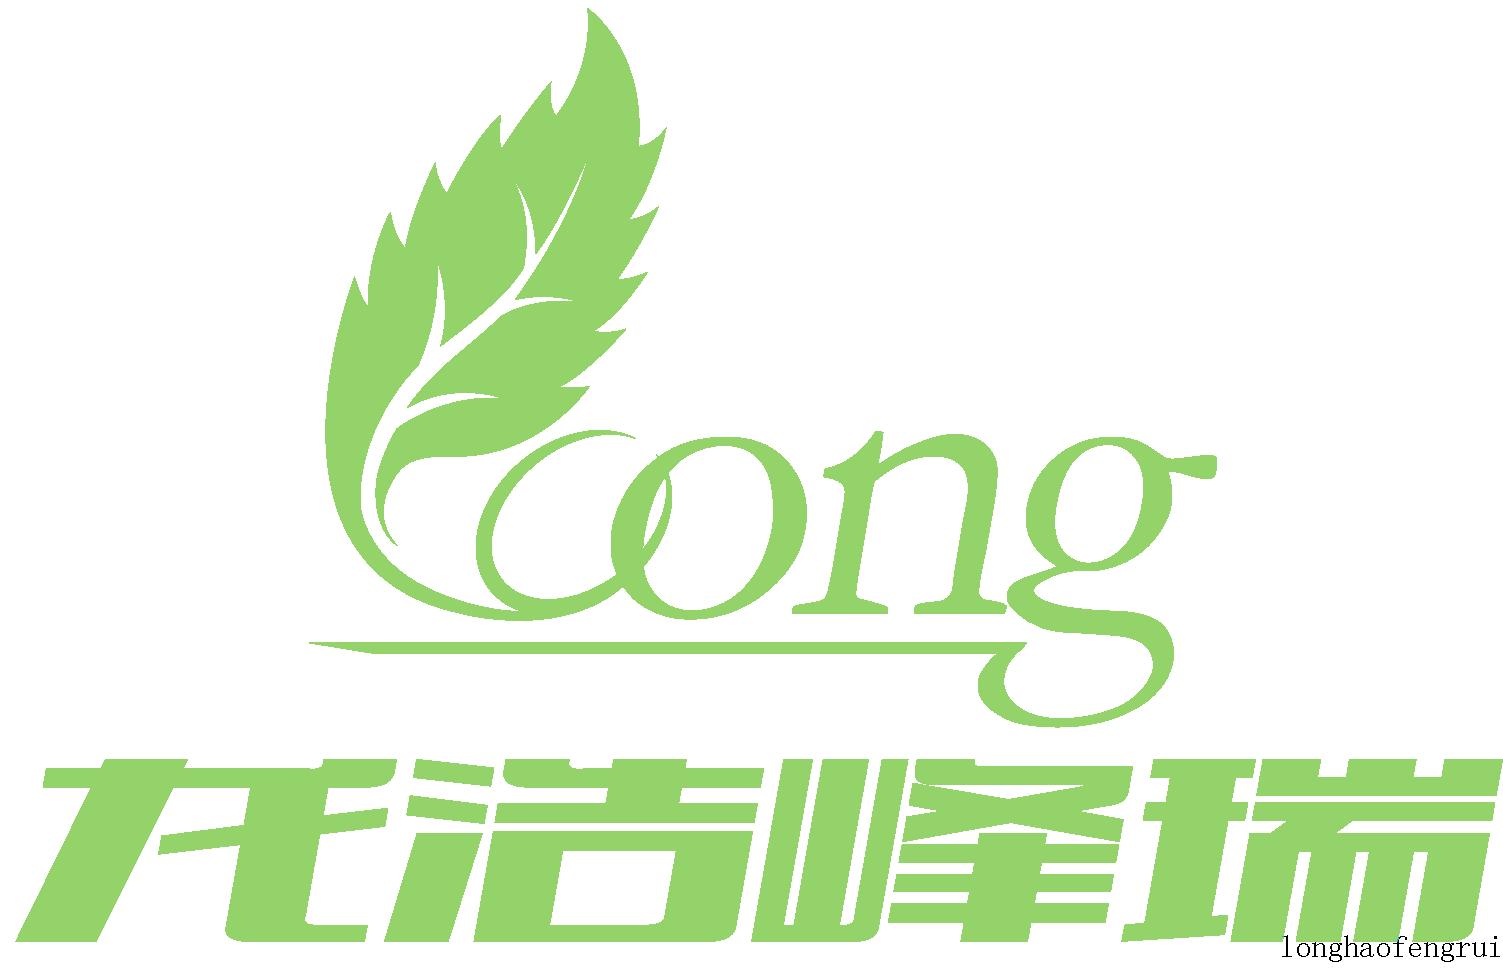 longhaofengrui